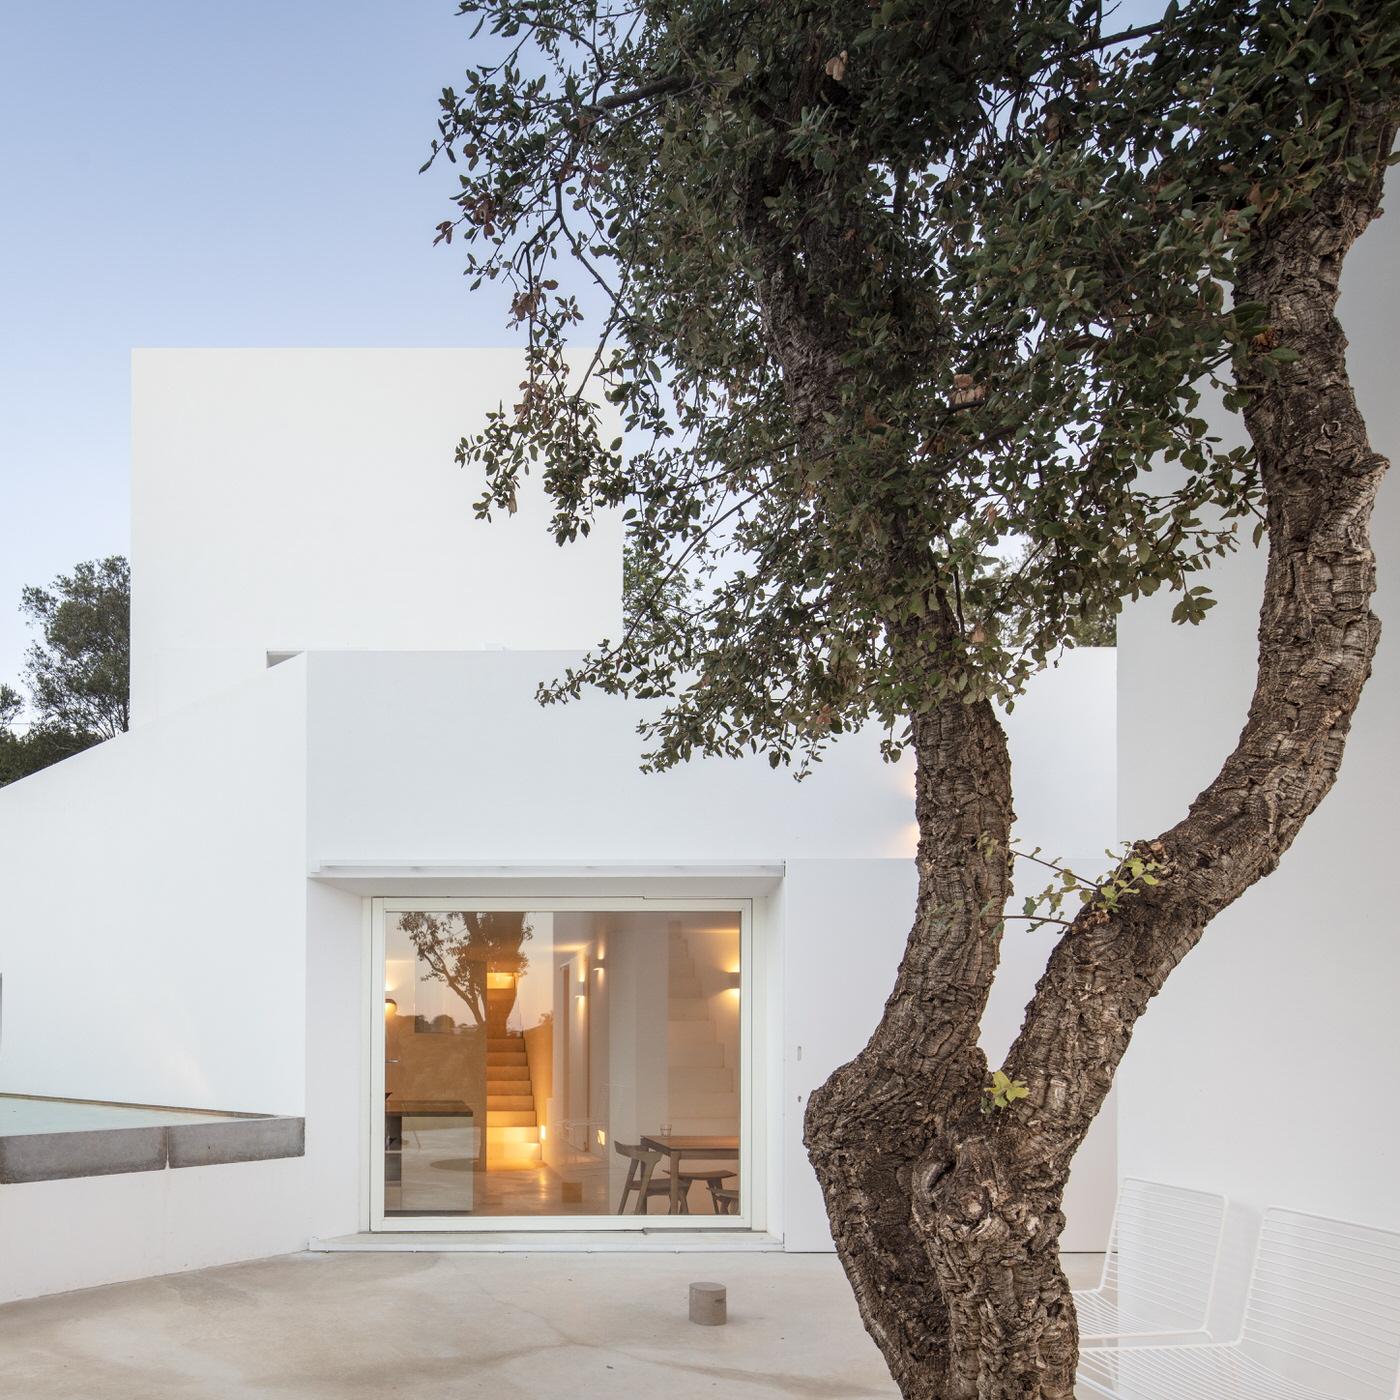 Zalig-Algarve-Casa-Luum-137-1_1